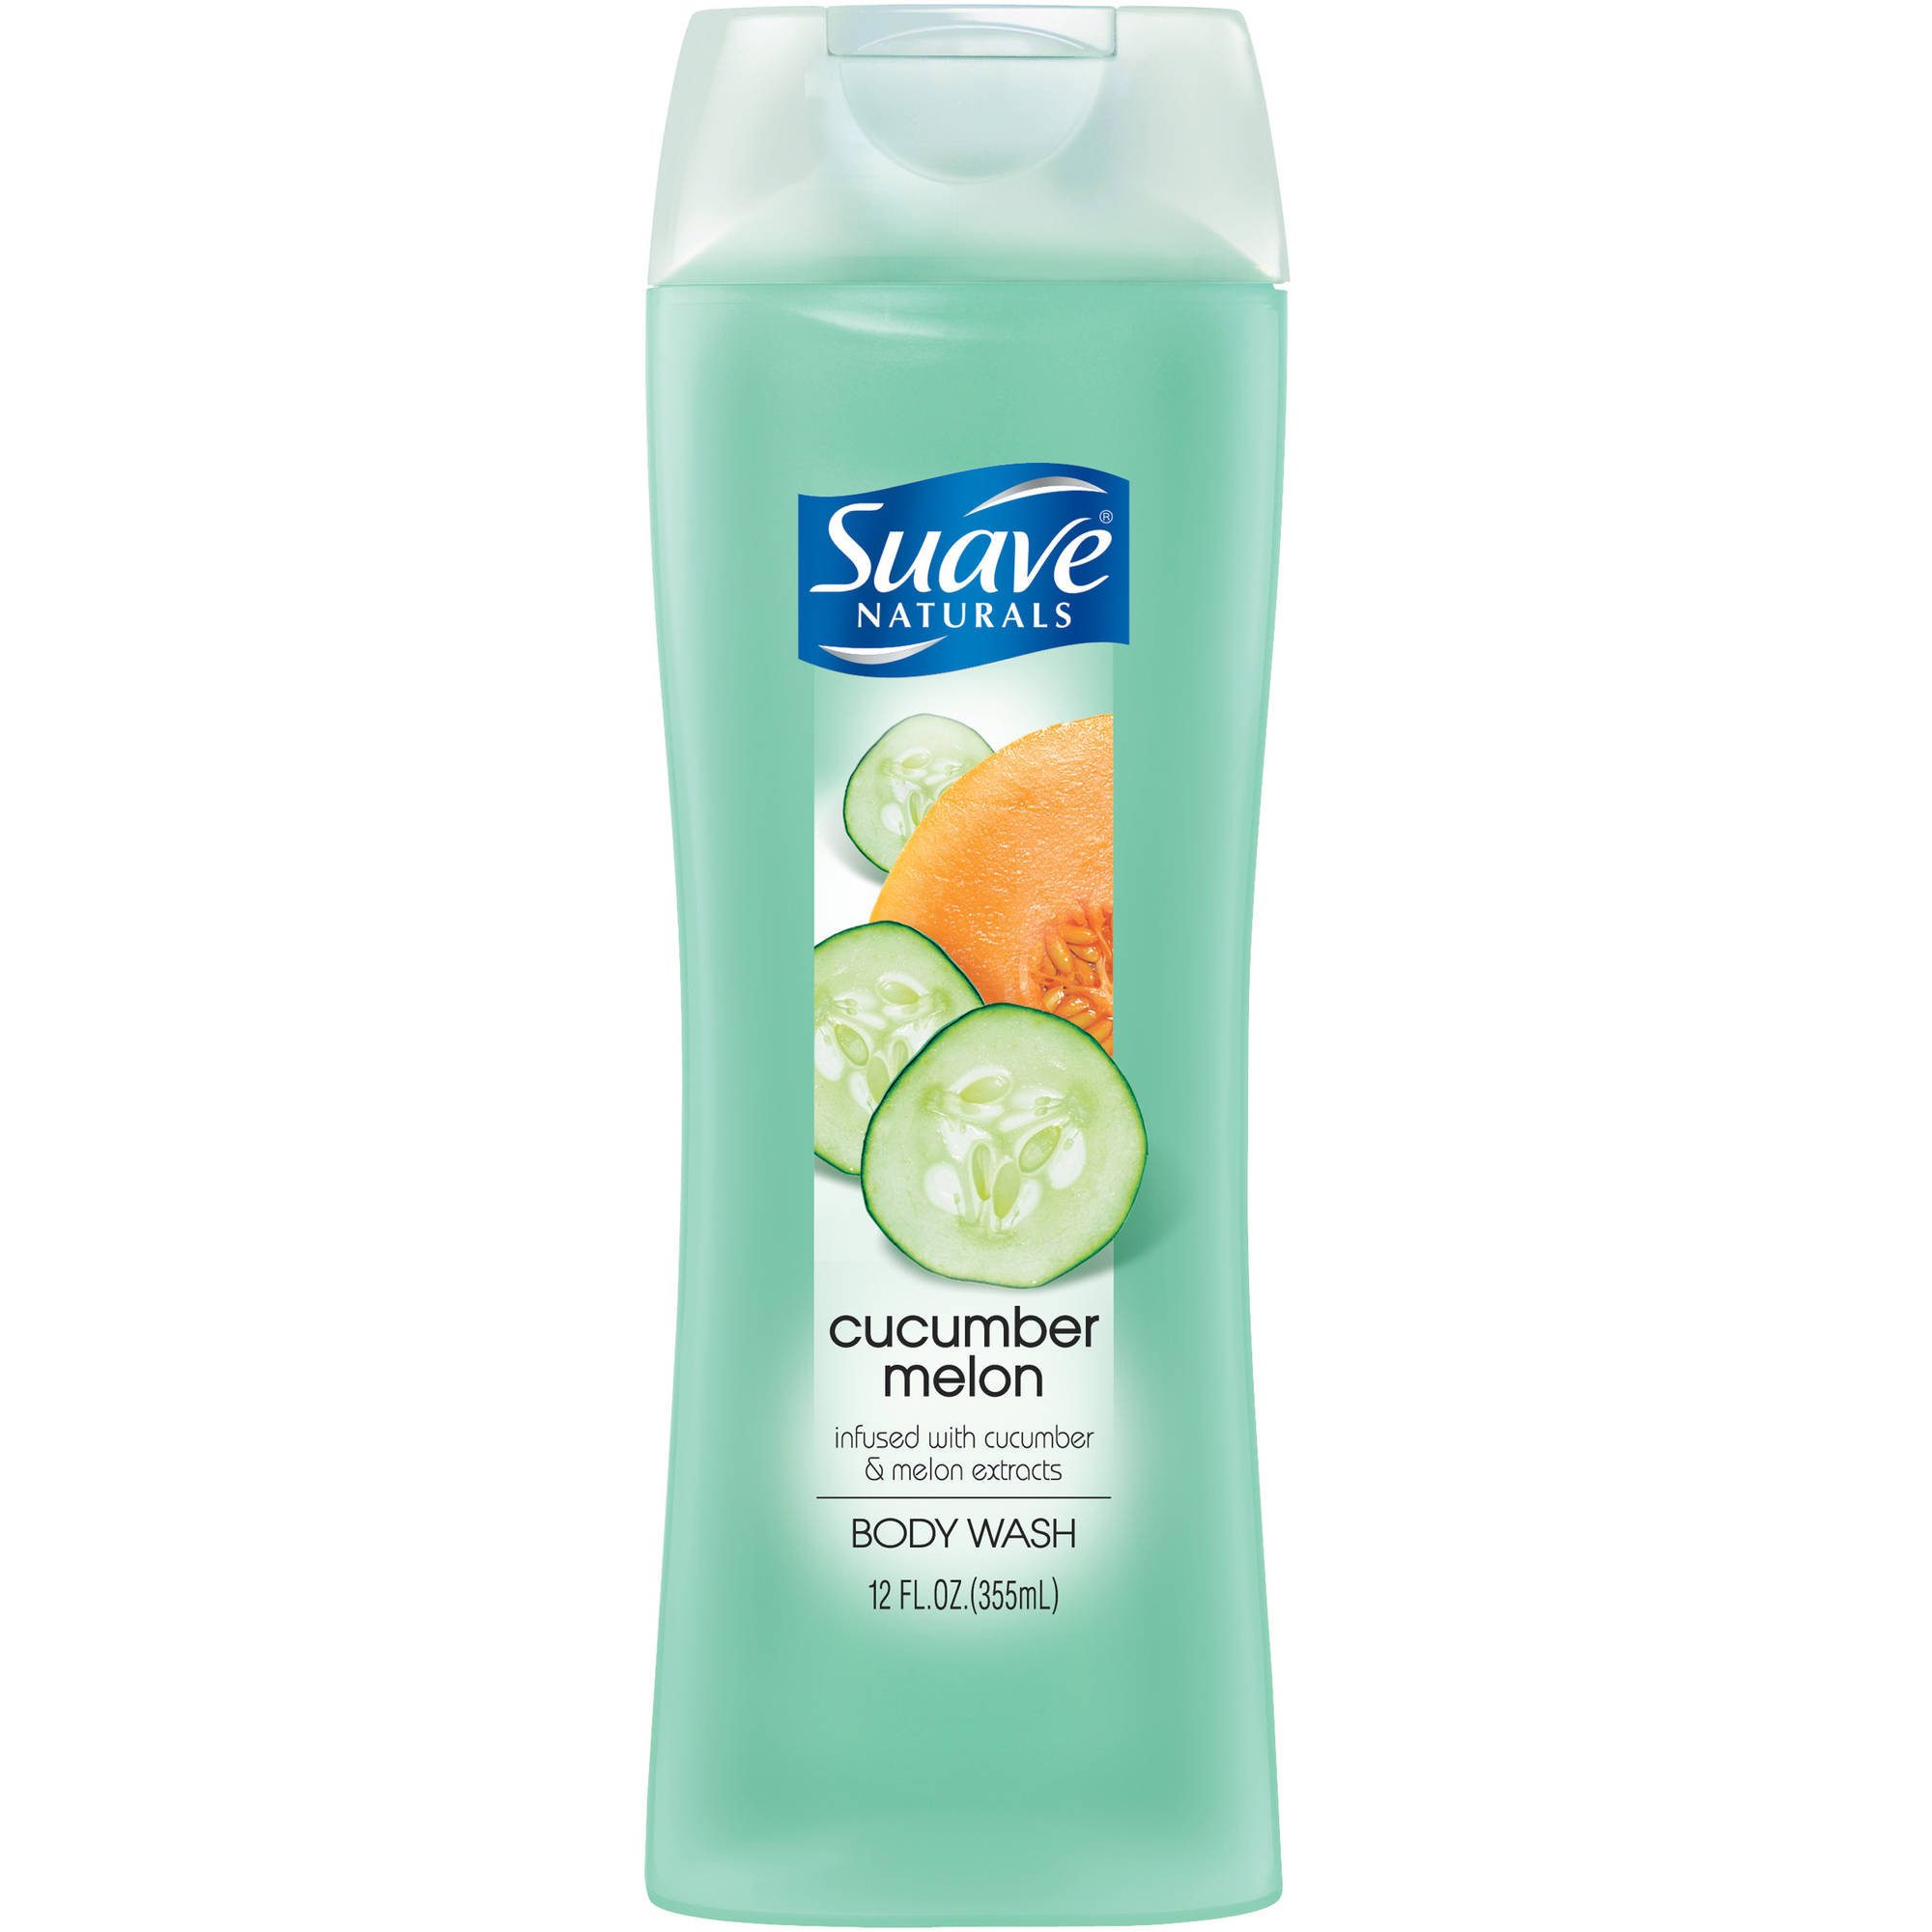 Suave Naturals Cucumber Melon Body Wash, 12 oz